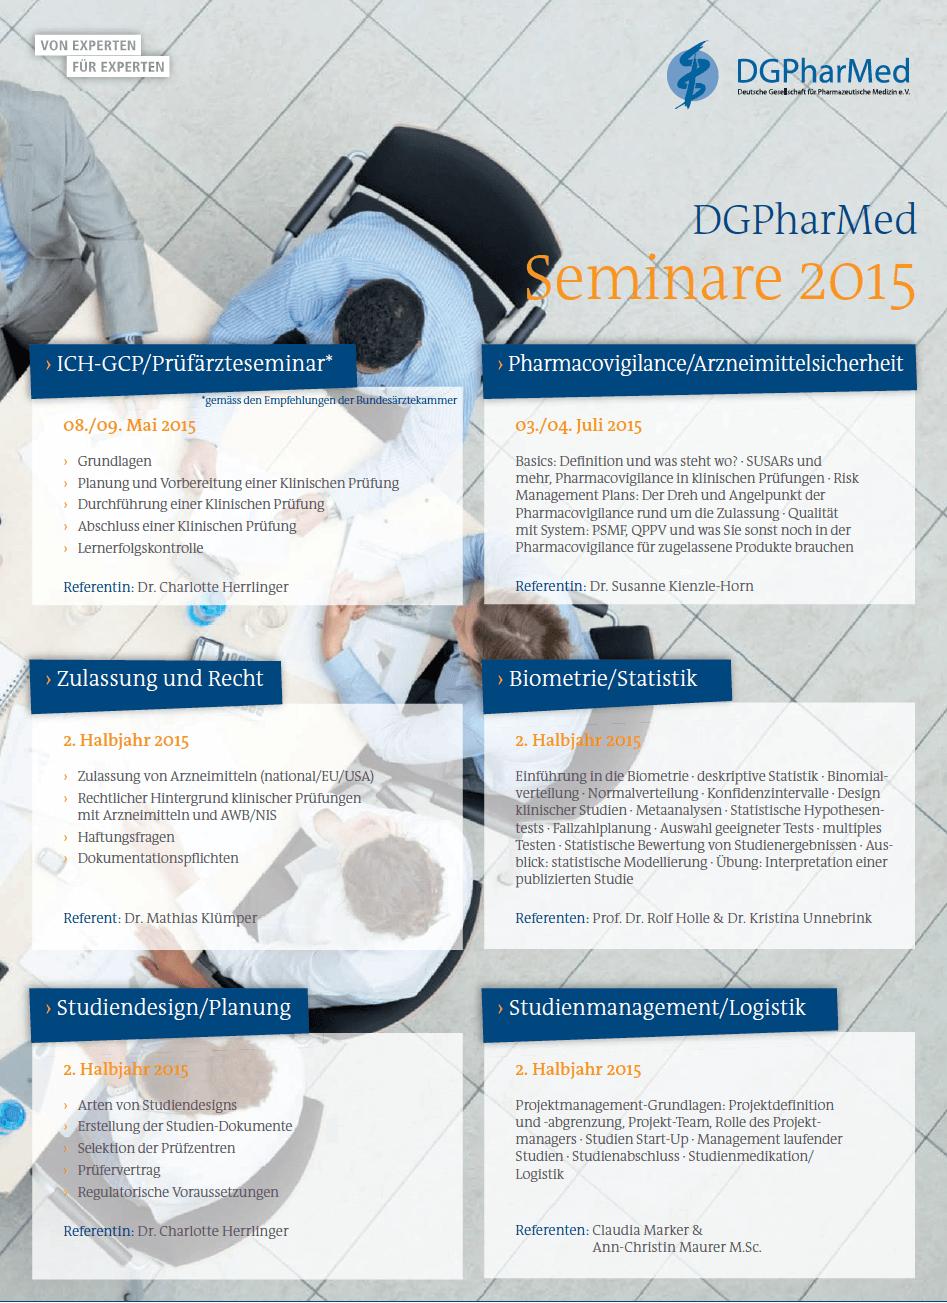 DGPharMed-Seminare-2015-Uebersicht